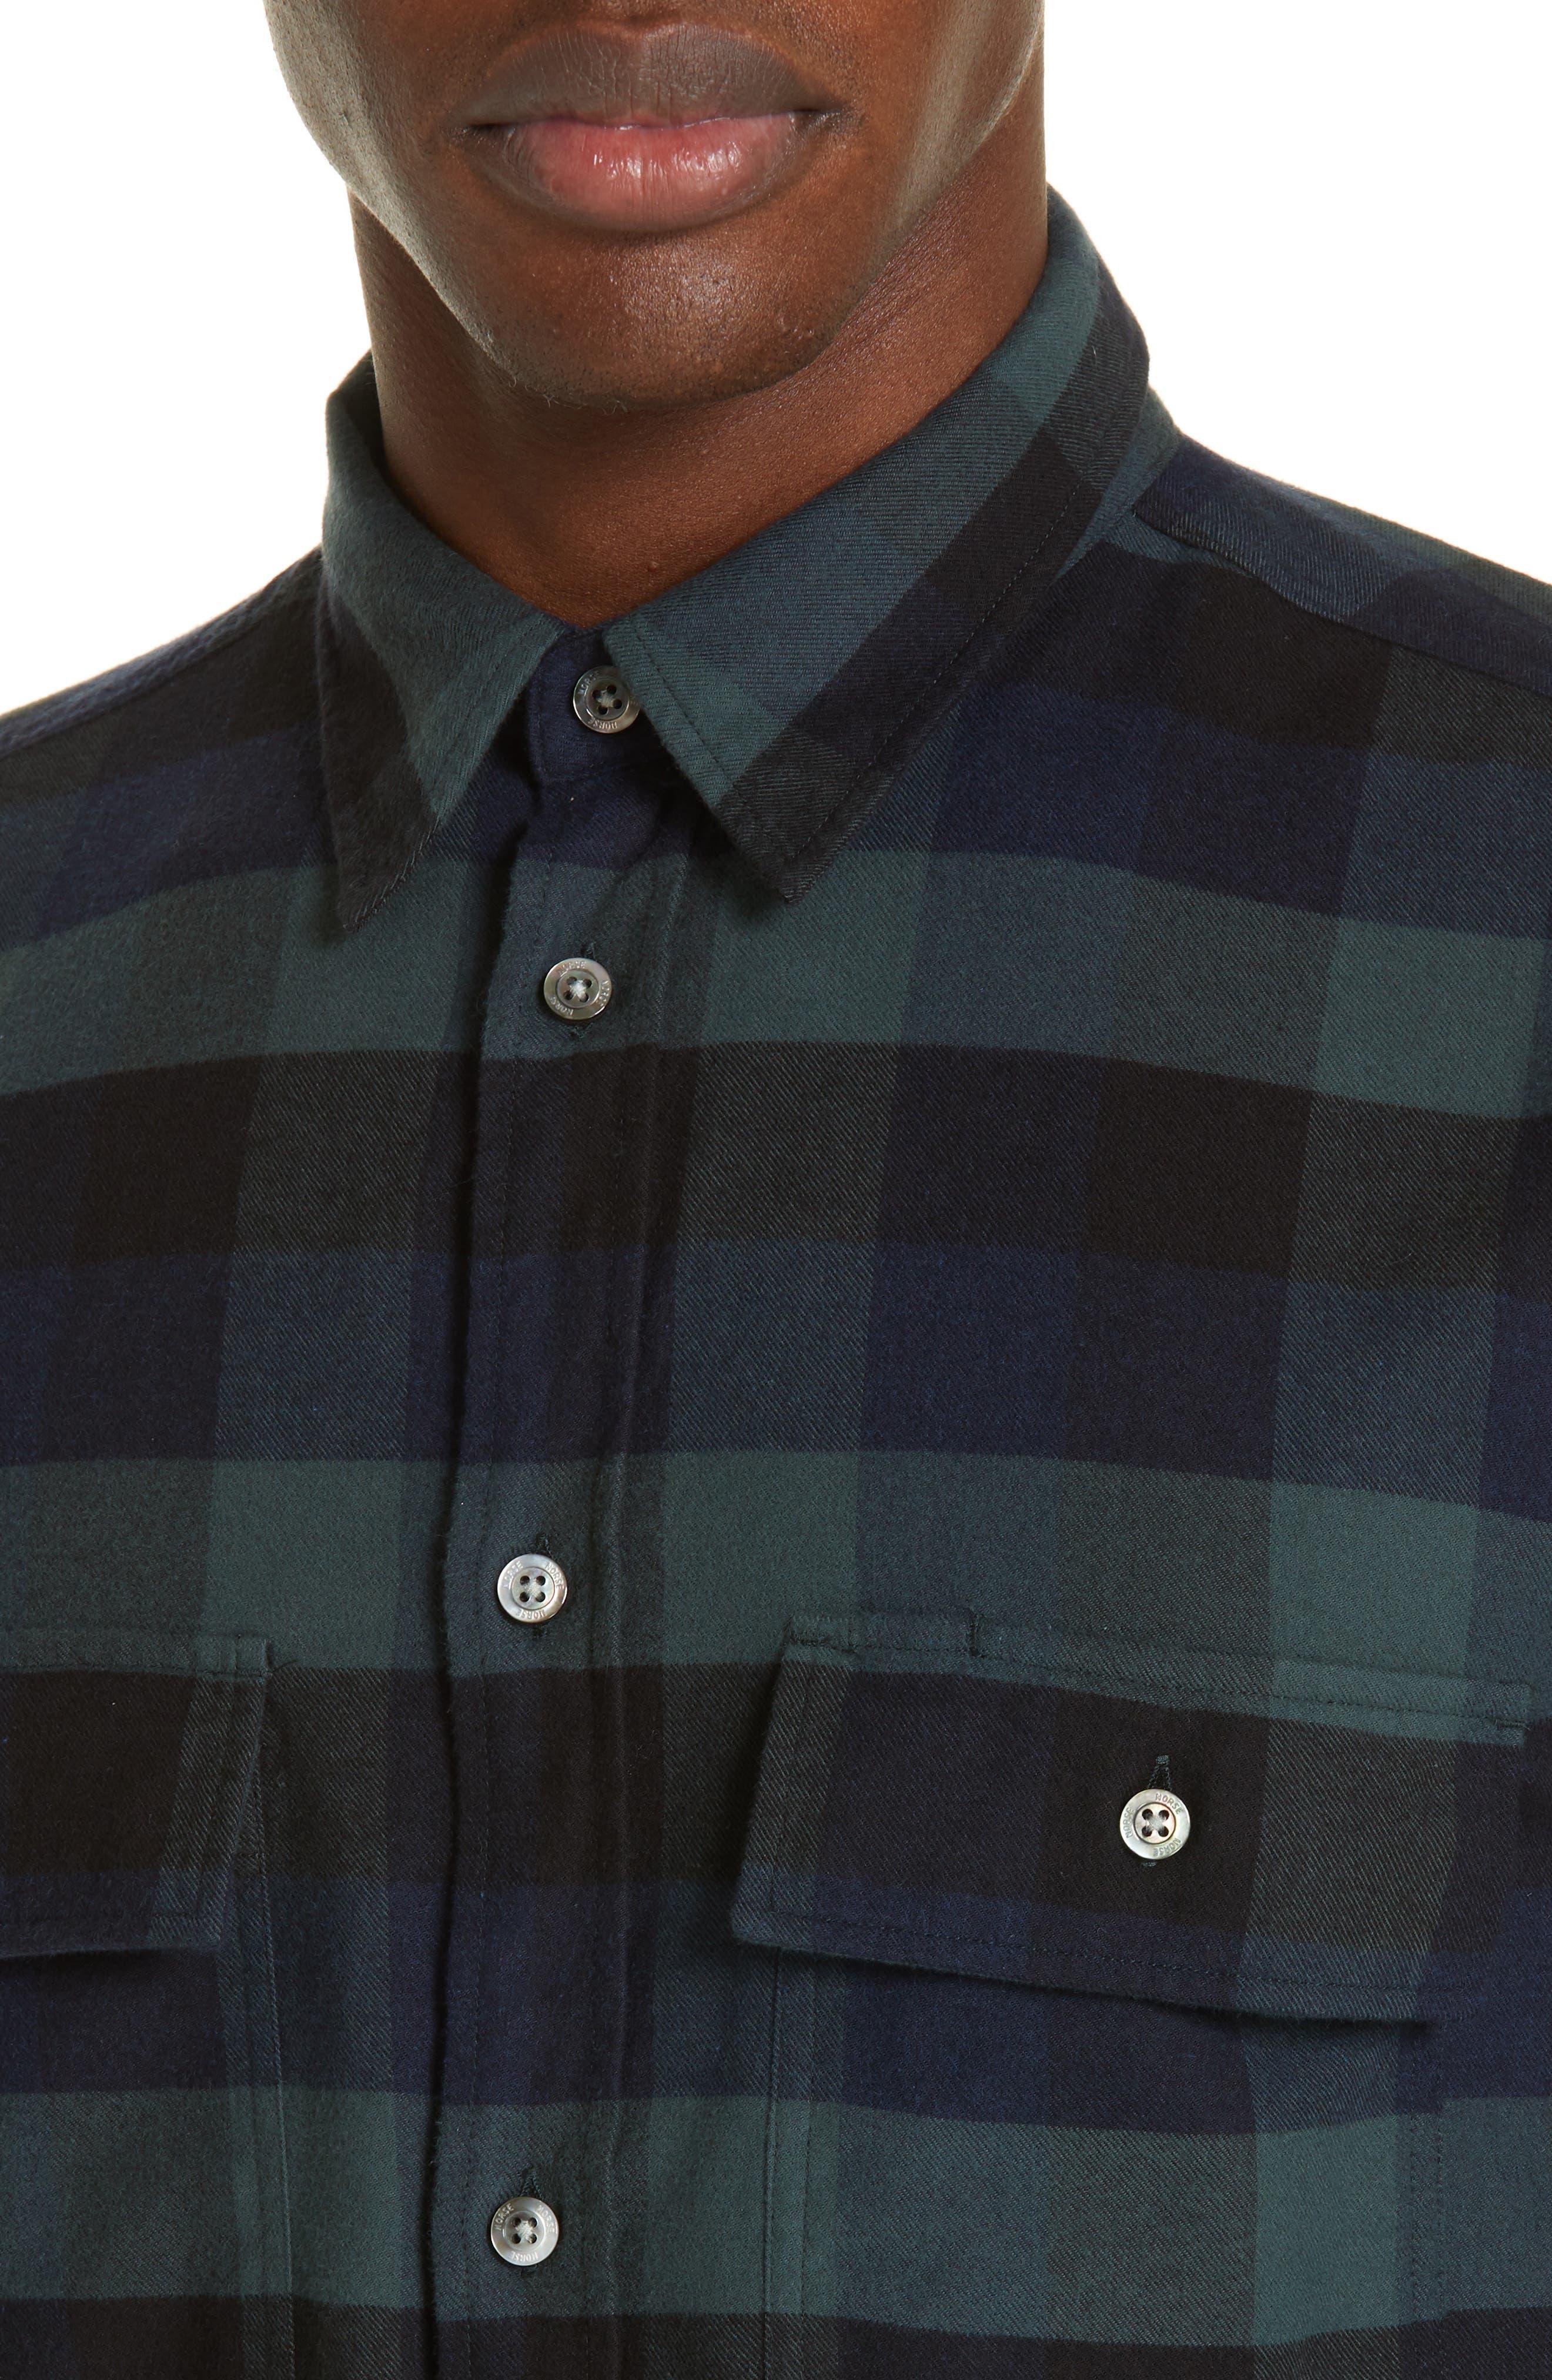 Villads Check Brushed Flannel Shirt,                             Alternate thumbnail 2, color,                             DARK NAVY